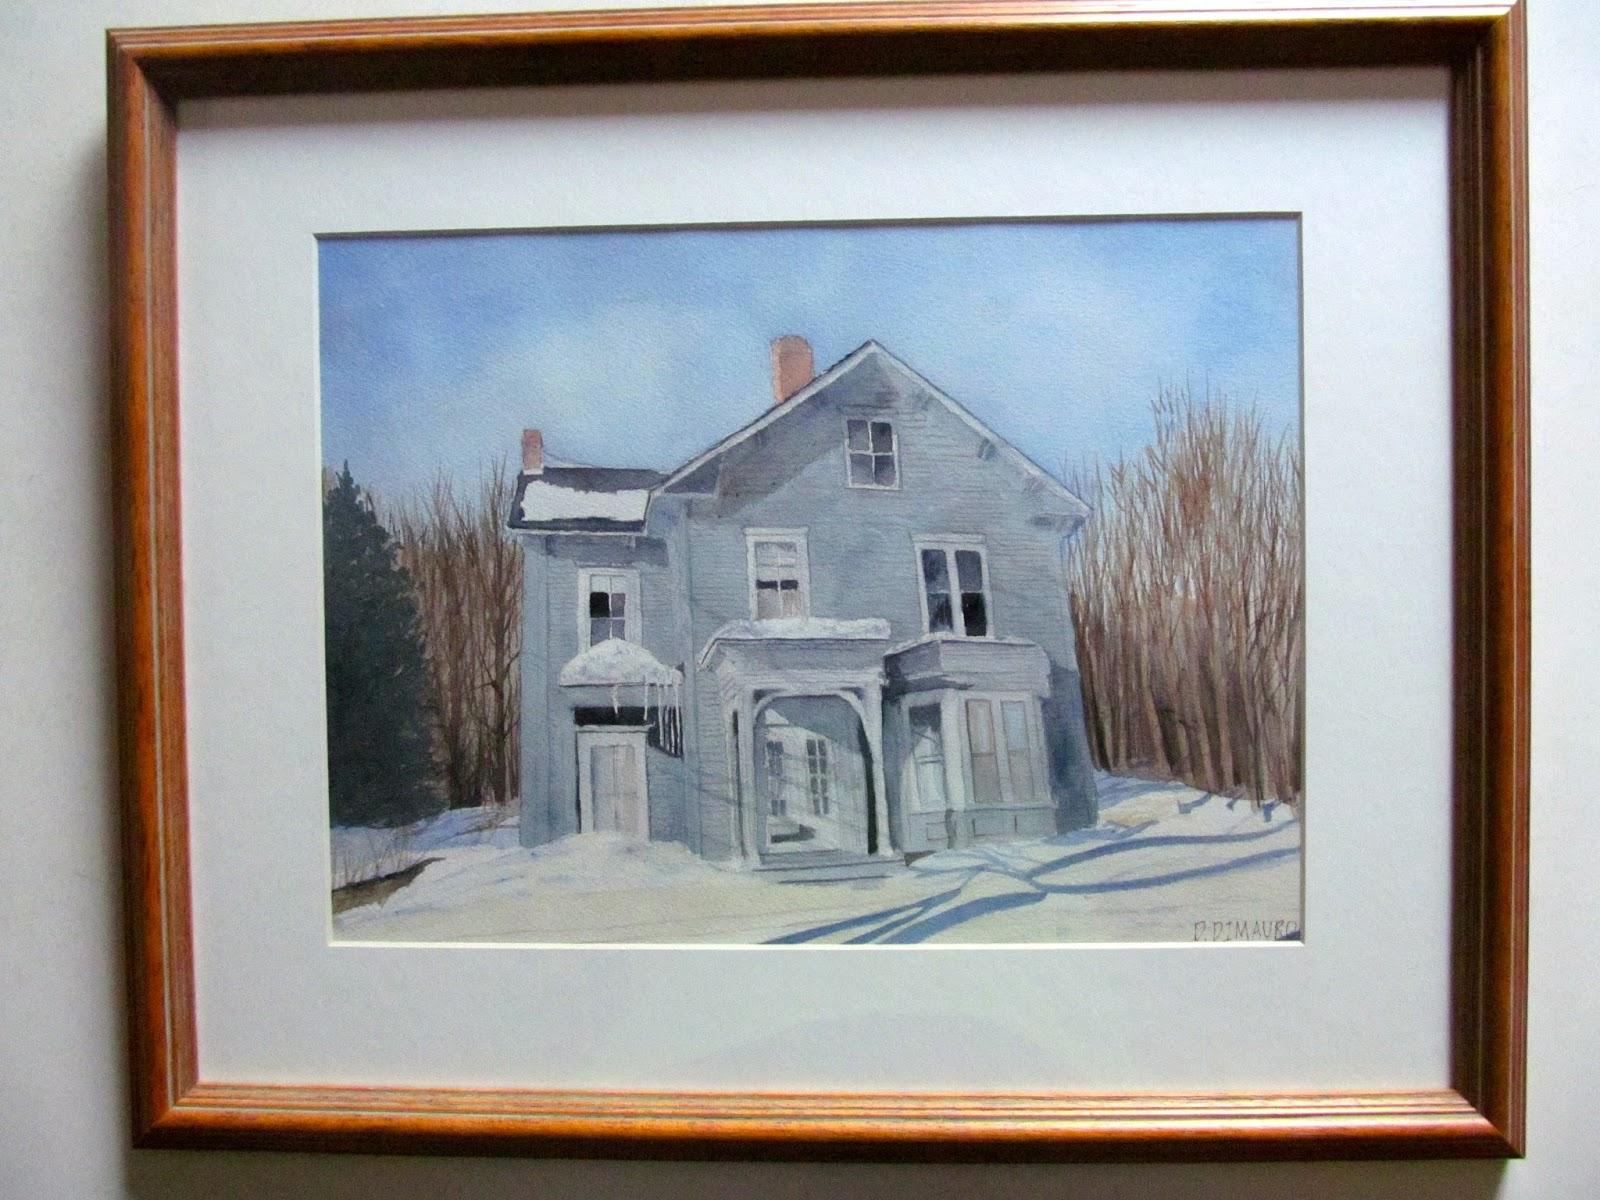 Dale DiMauro: Framing watercolors for Art-in-the-Park